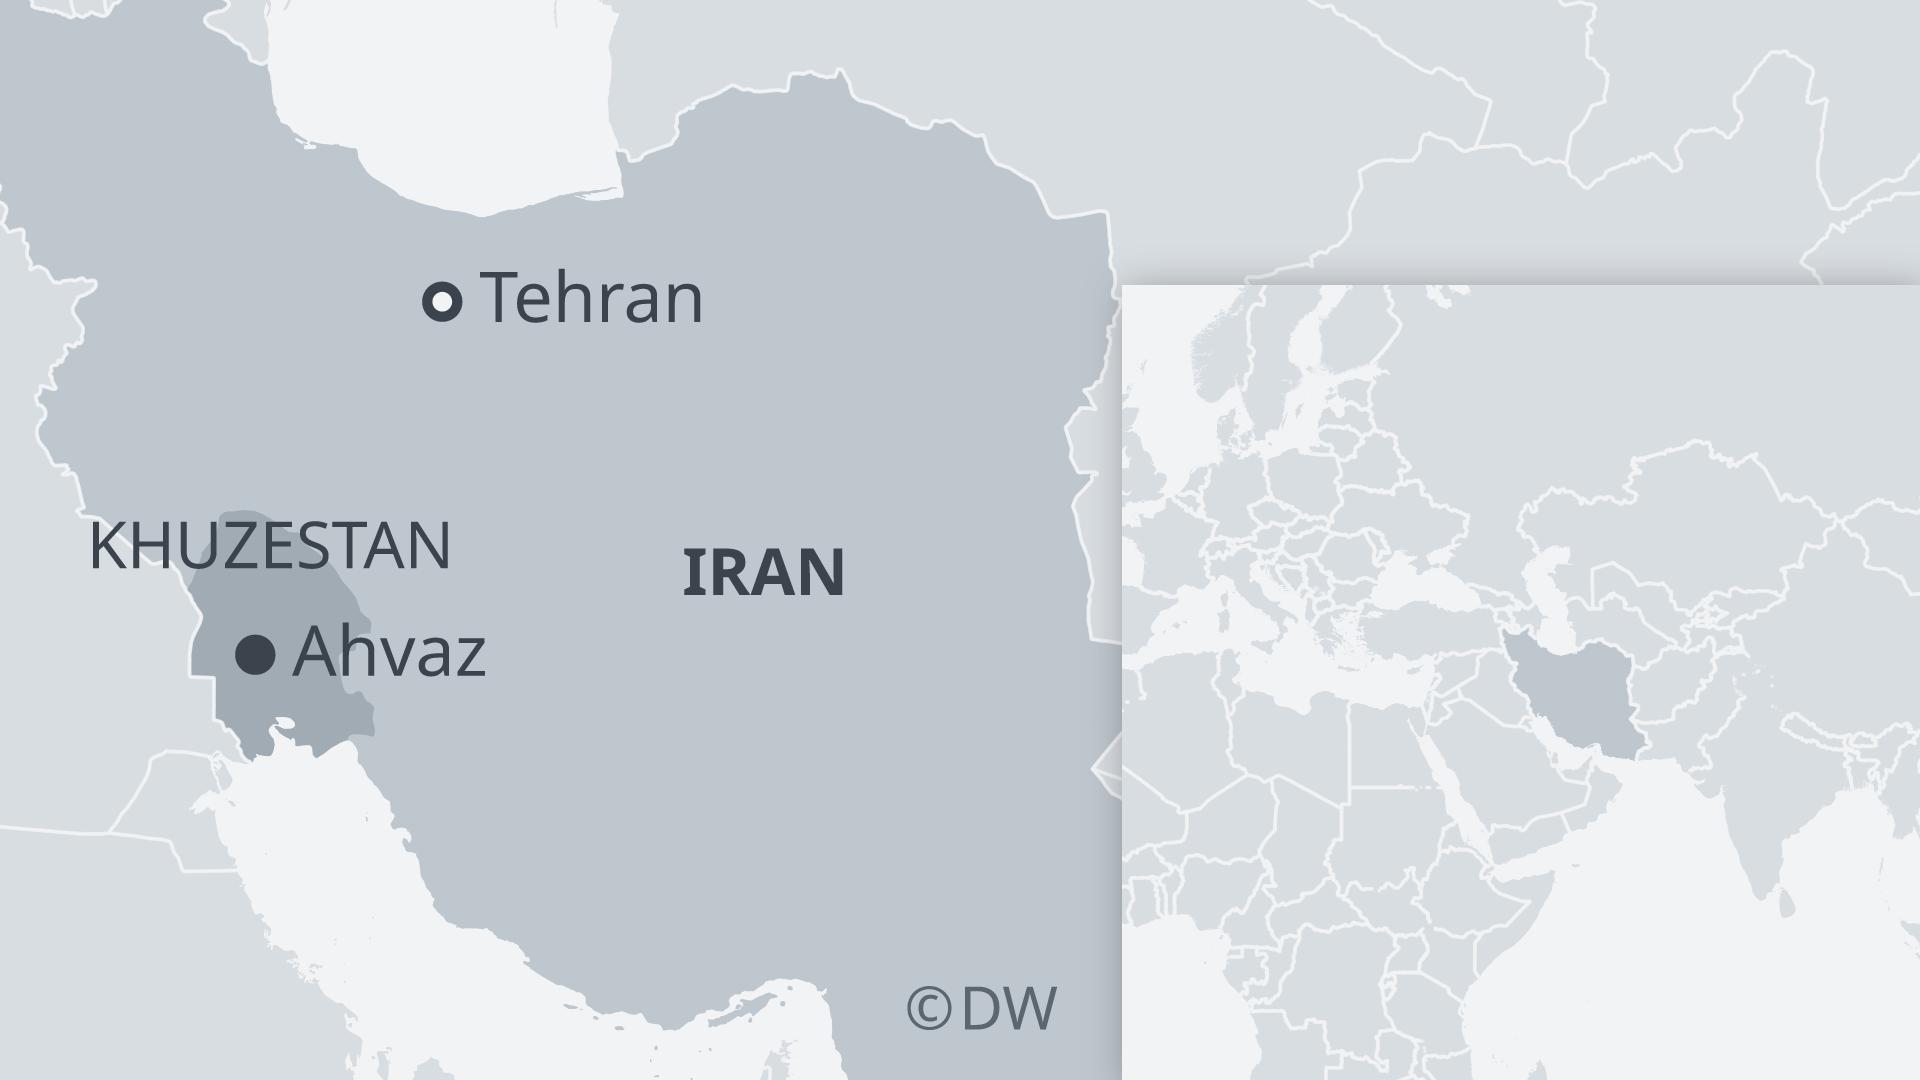 Map of Iran showing Tehran, Ahvaz and Khuzestan